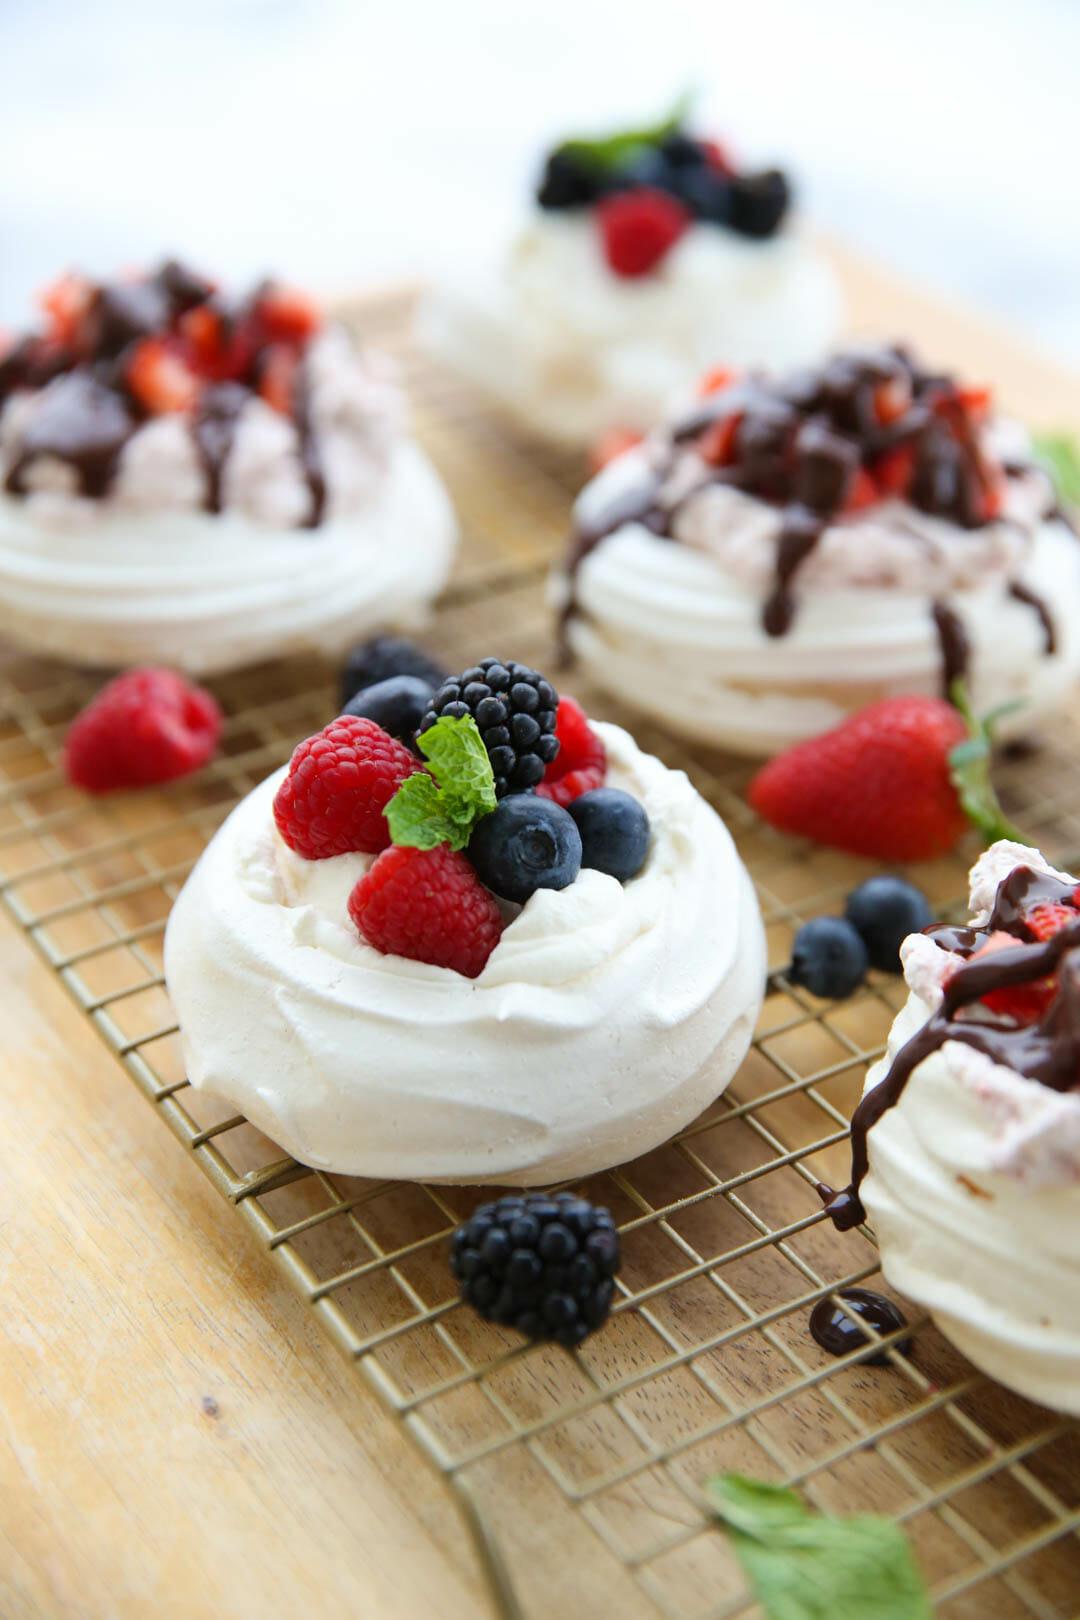 Easy Pavlova Recipe with Berries and Cream